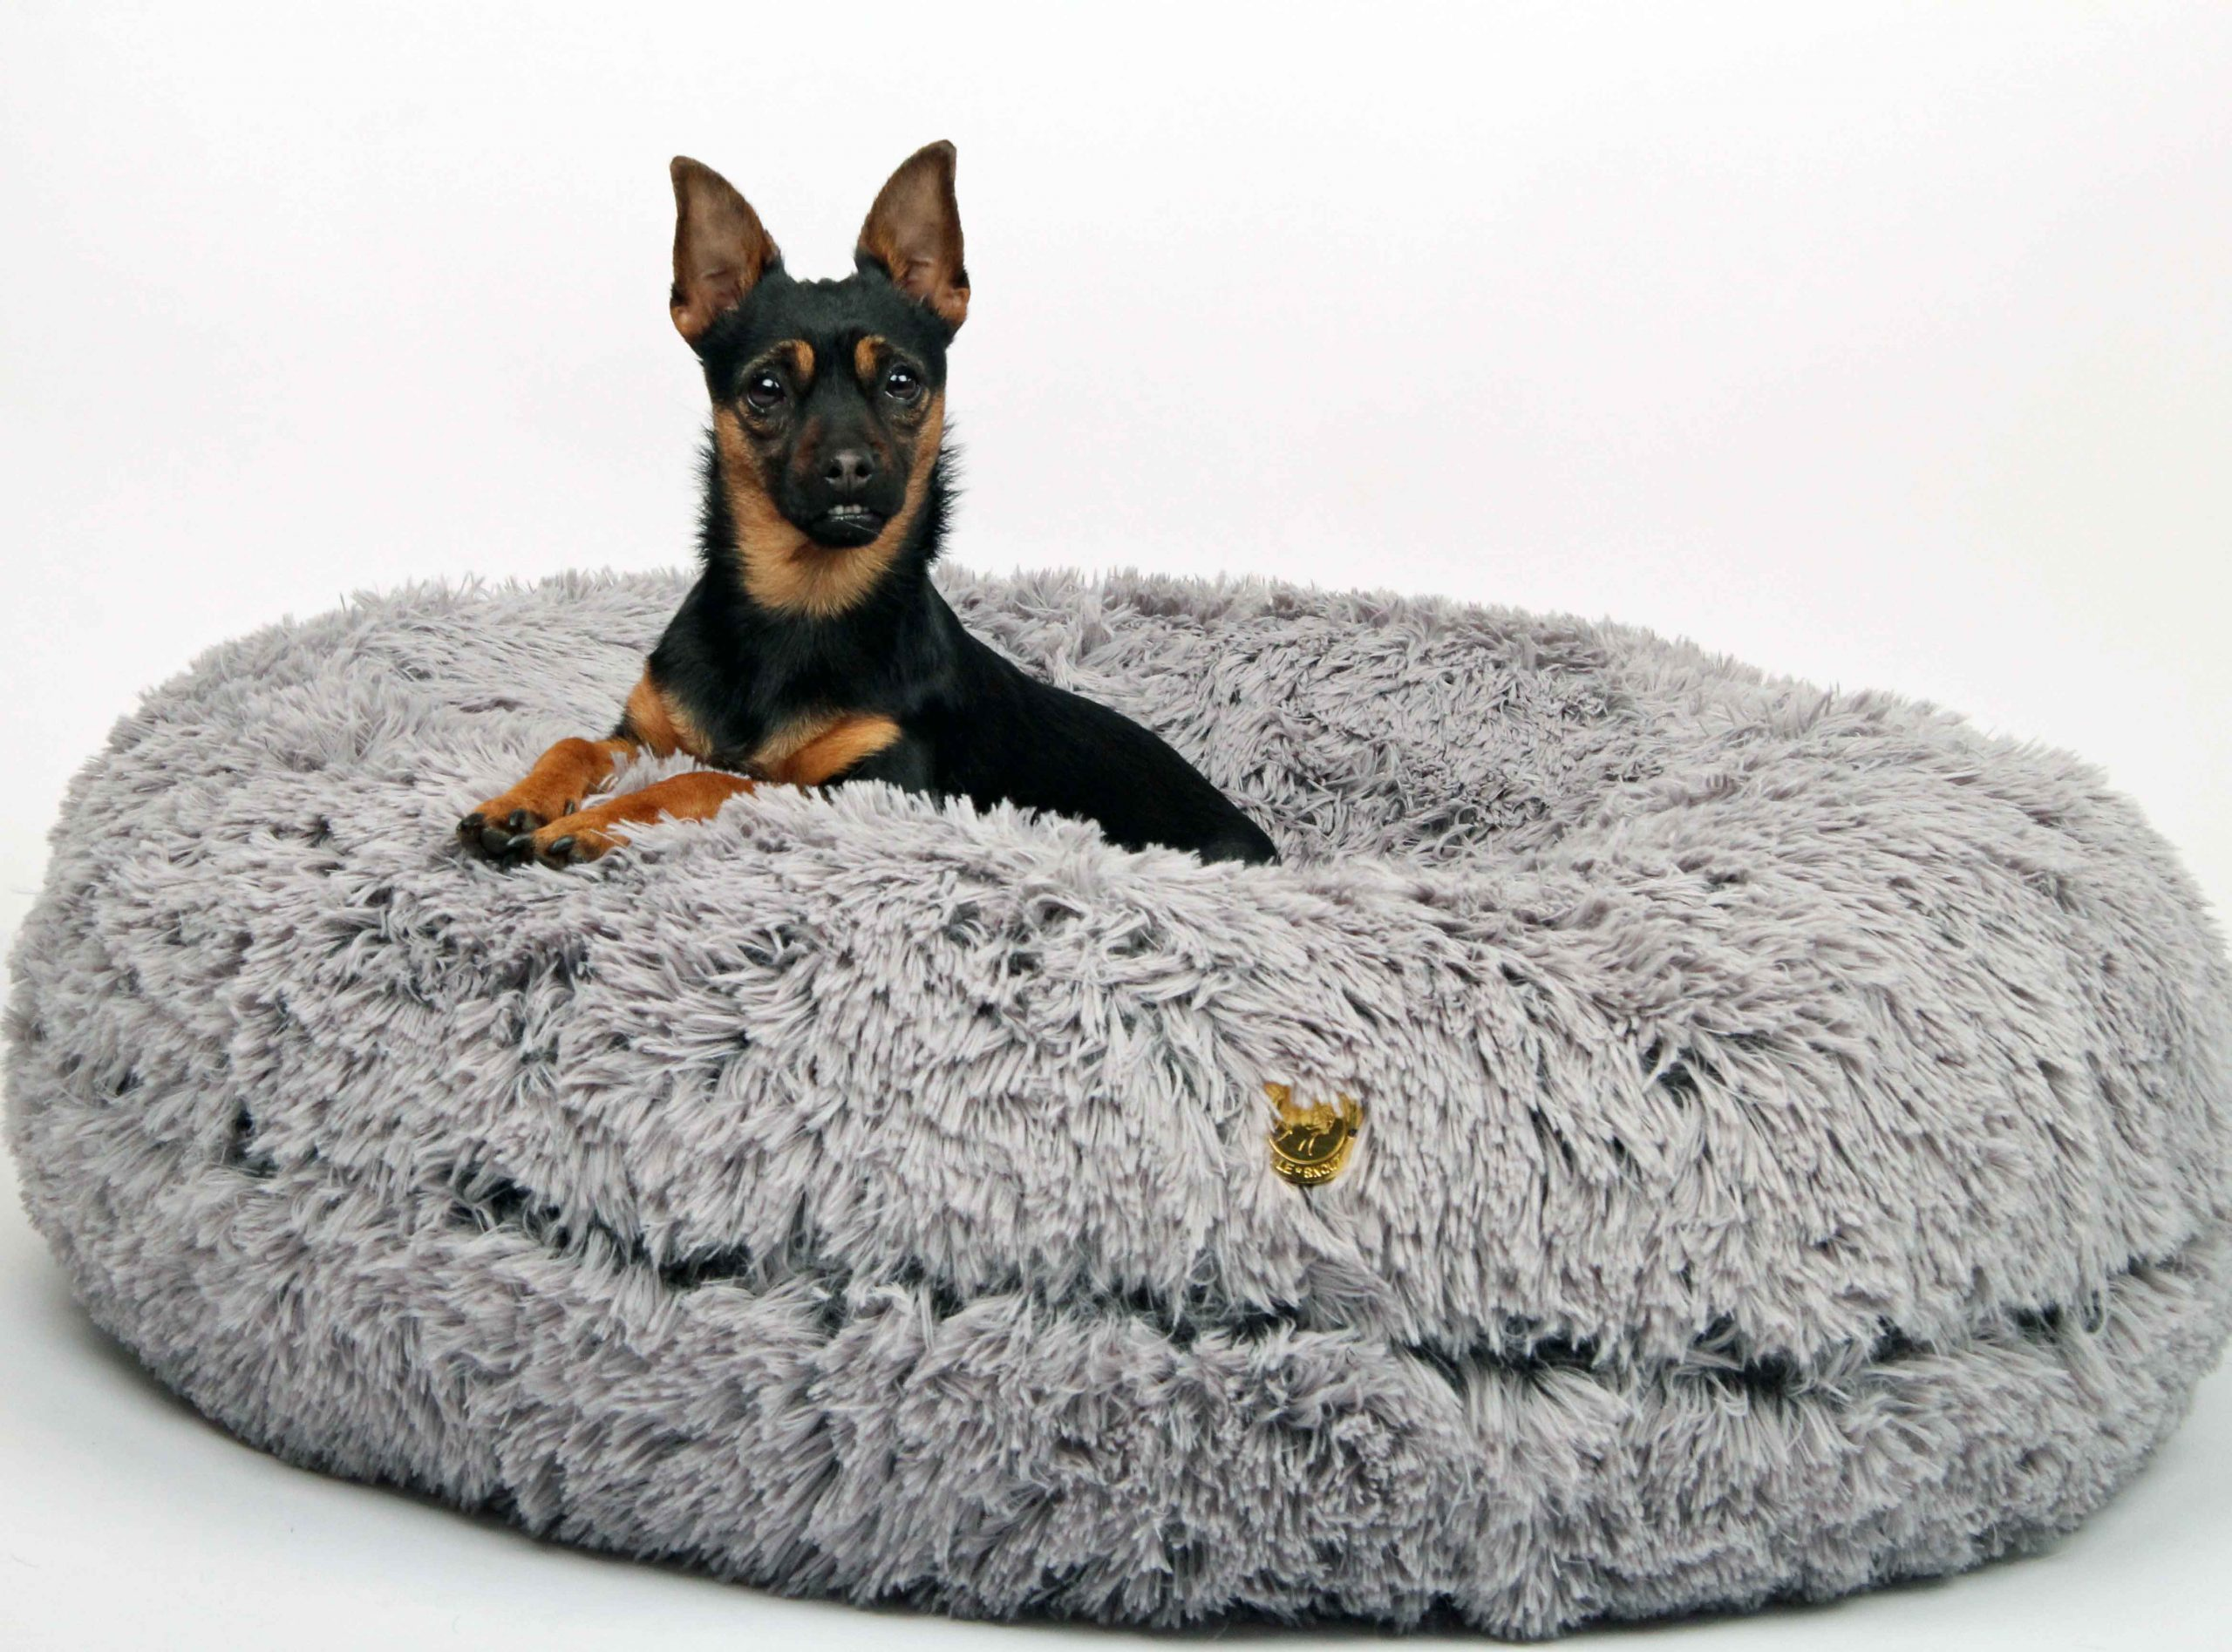 Full Size of Hundebett Wolke Zooplus Flocke 120 Cm Kaufen Bitiba 125 90 Xxl Wohnzimmer Hundebett Wolke Zooplus